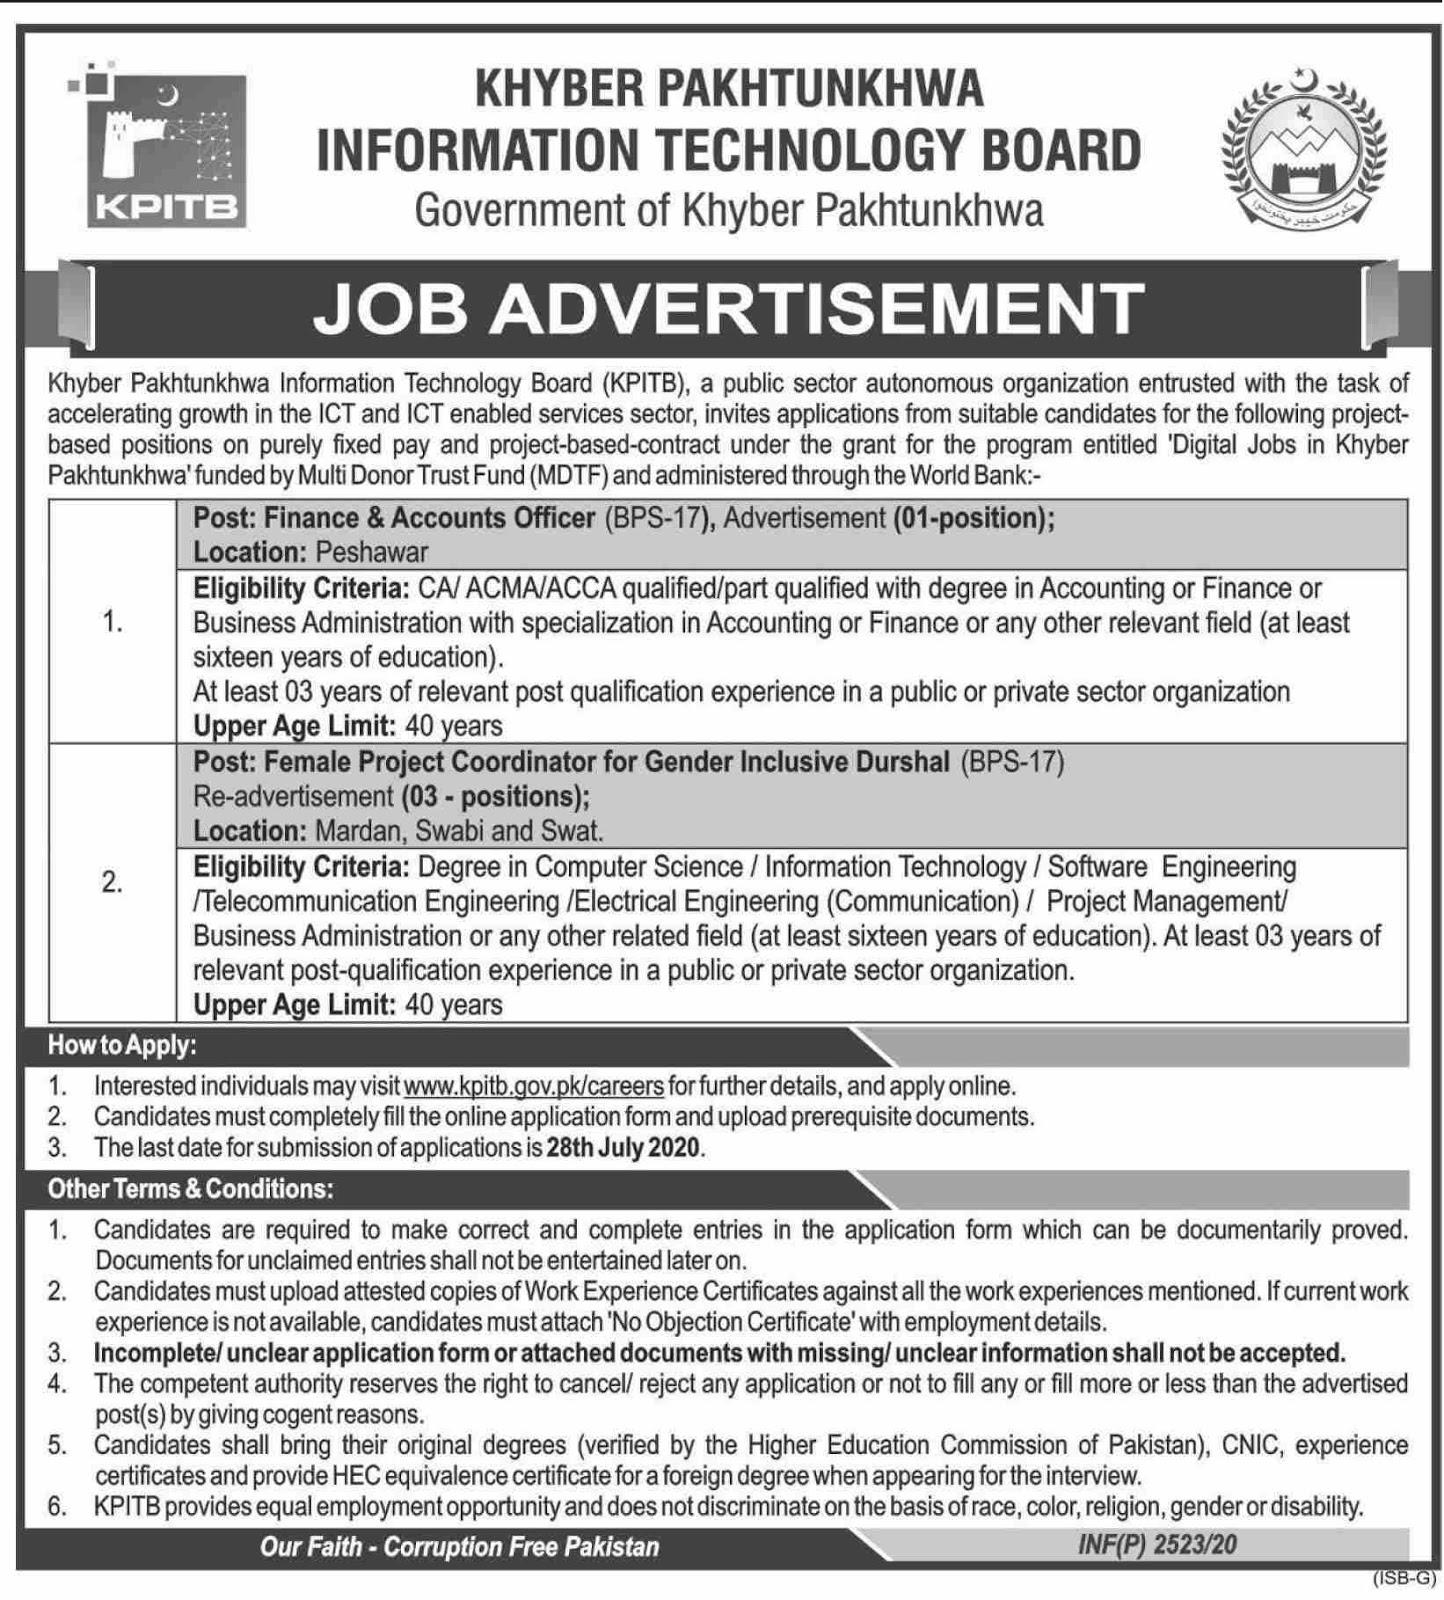 KPK Technology Board Jobs 2020